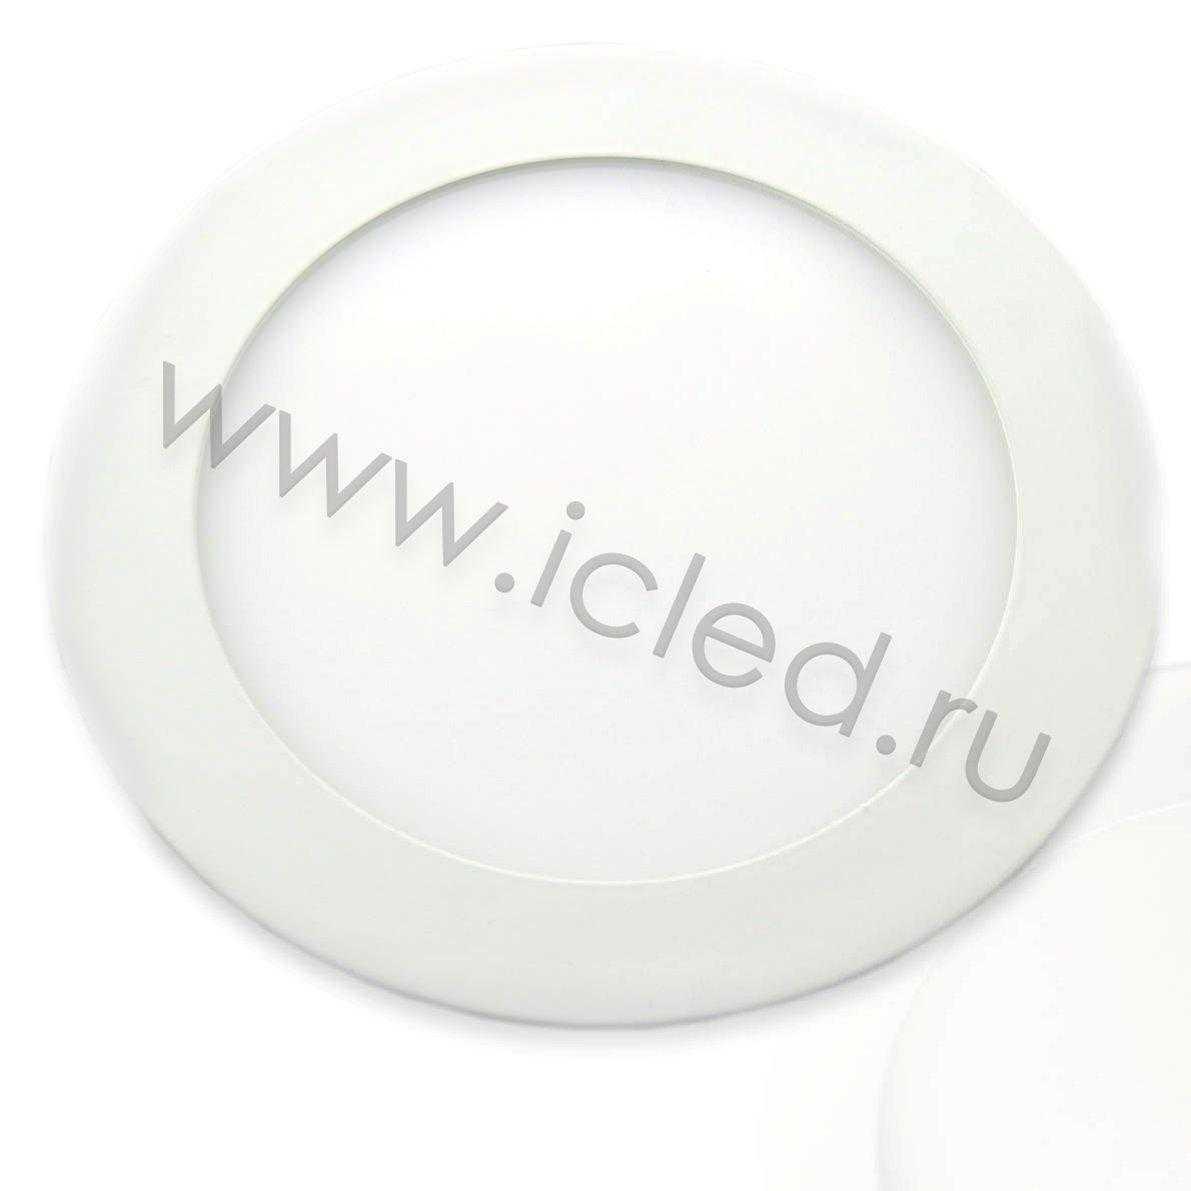 Светодиодный светильник потолочный IC-RW D180мм (11W, Warm White)